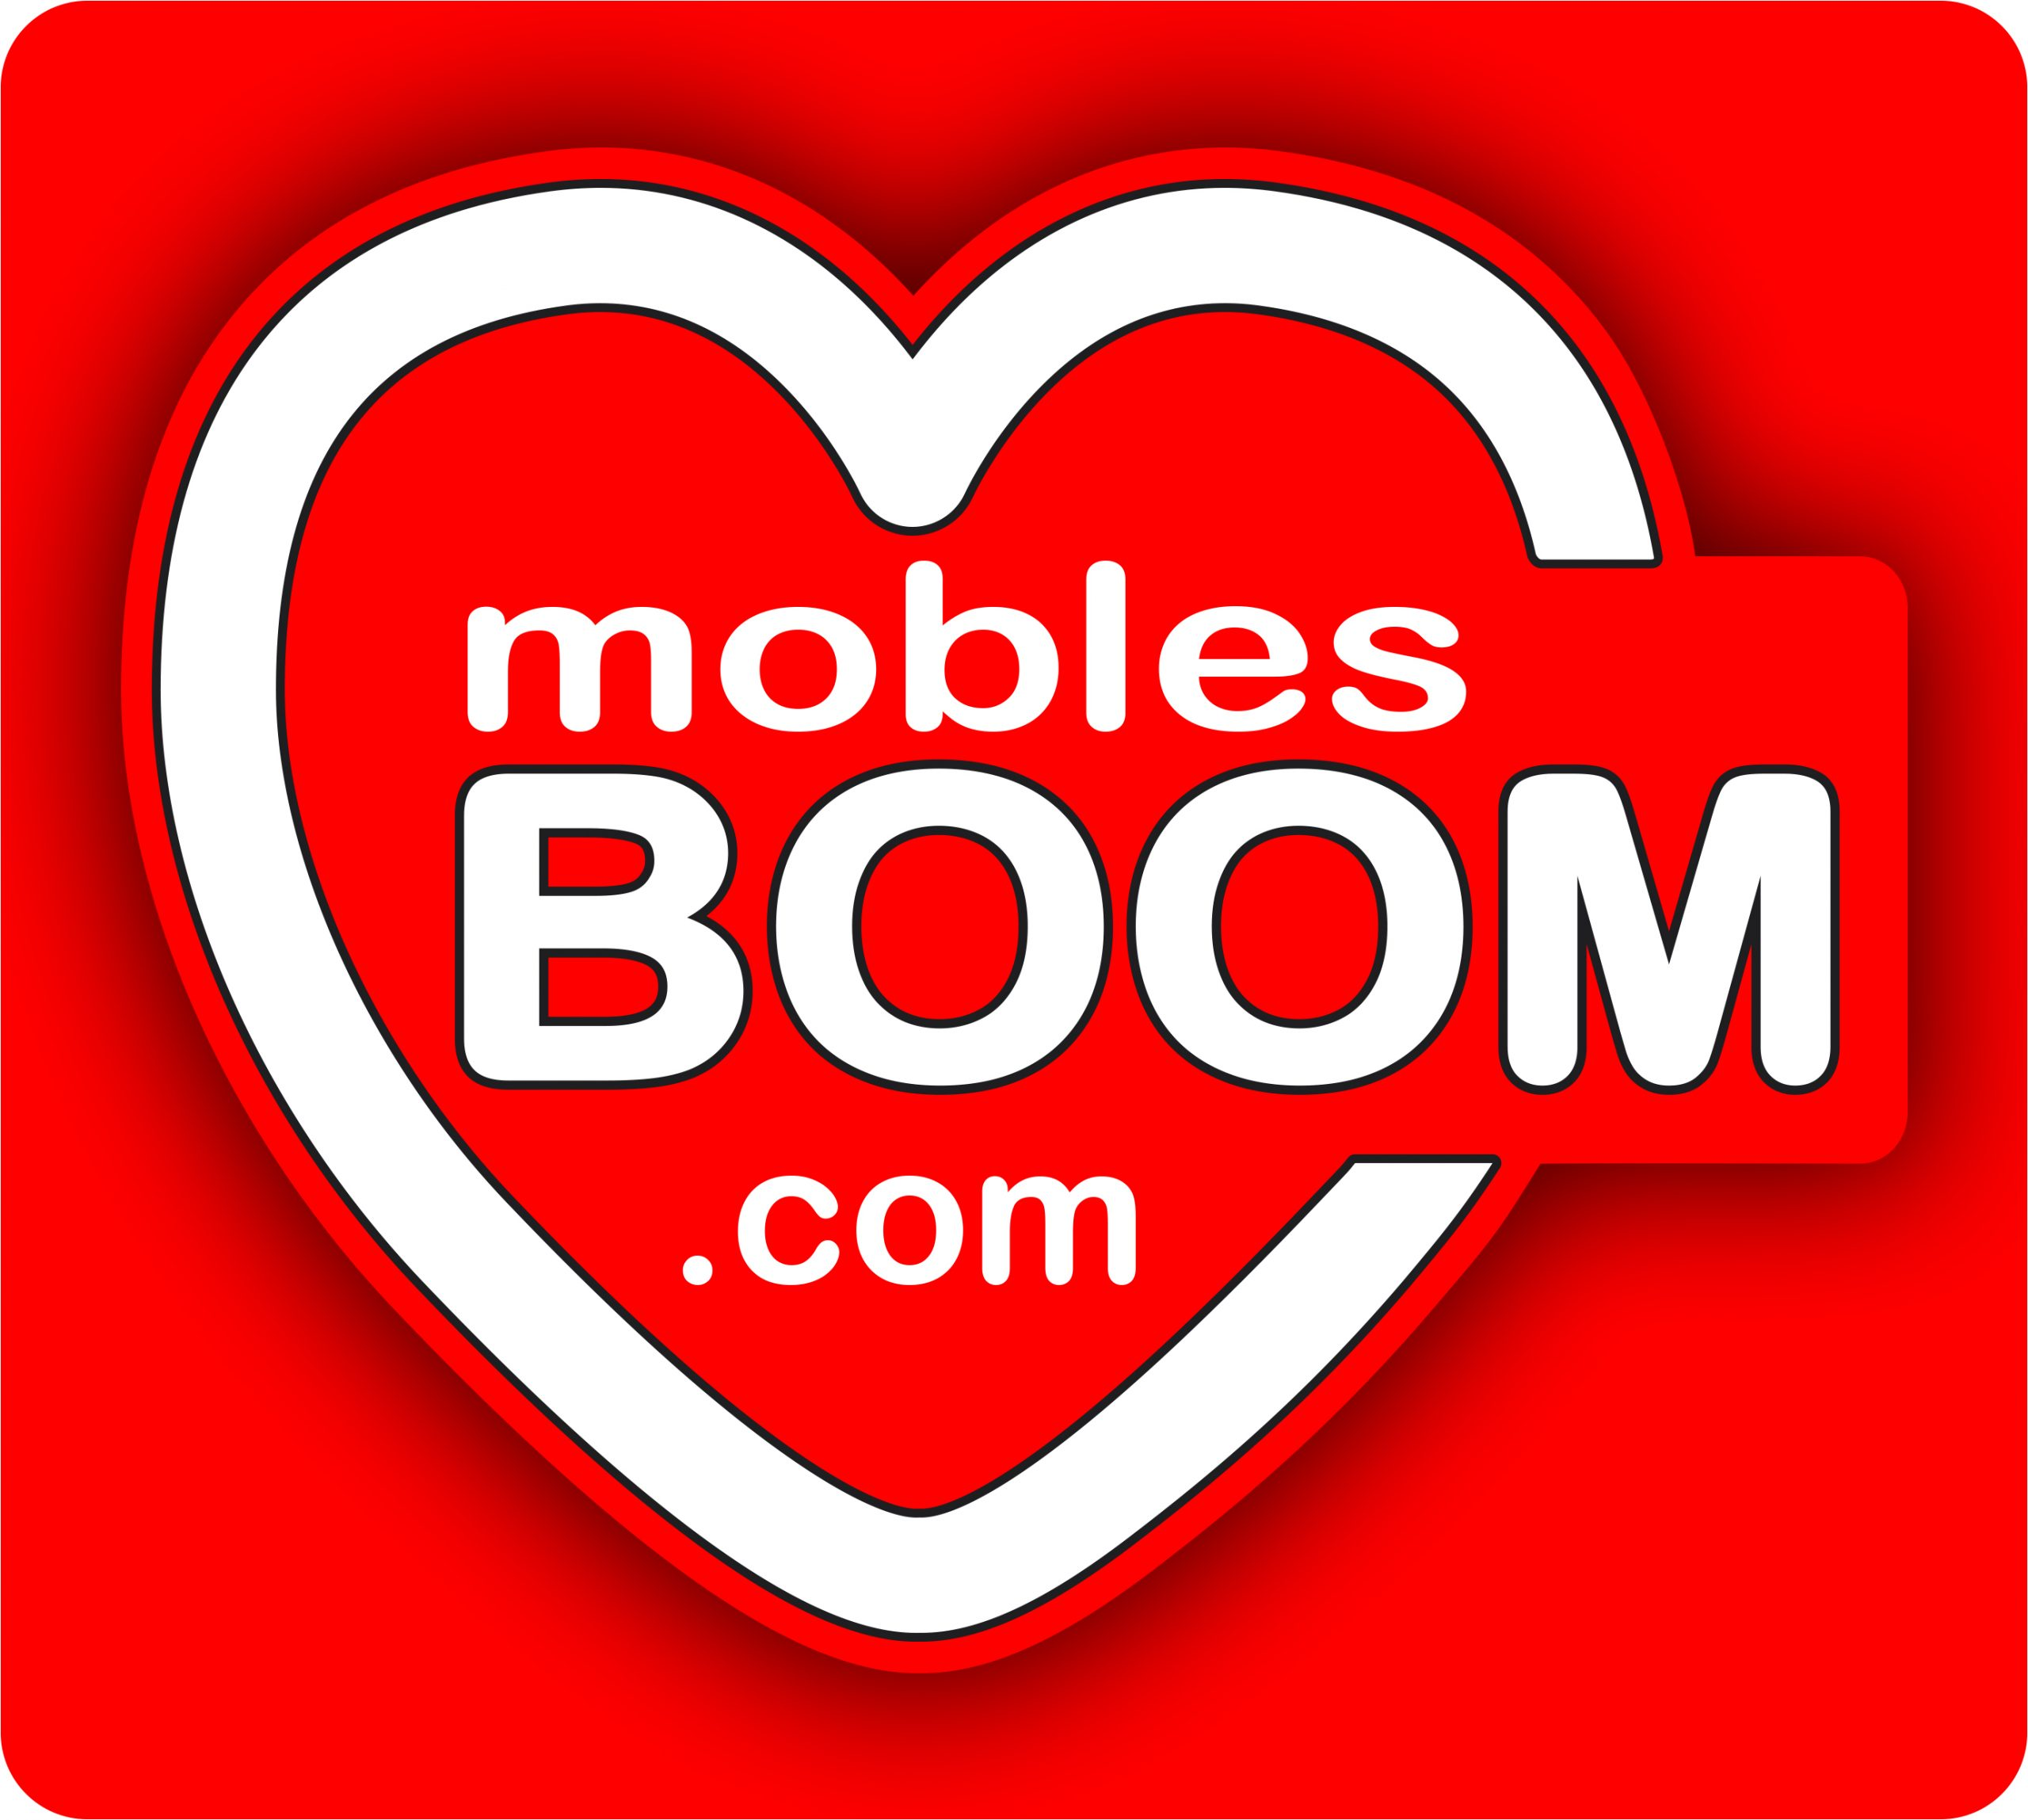 Mobles Boom Via Sabadell